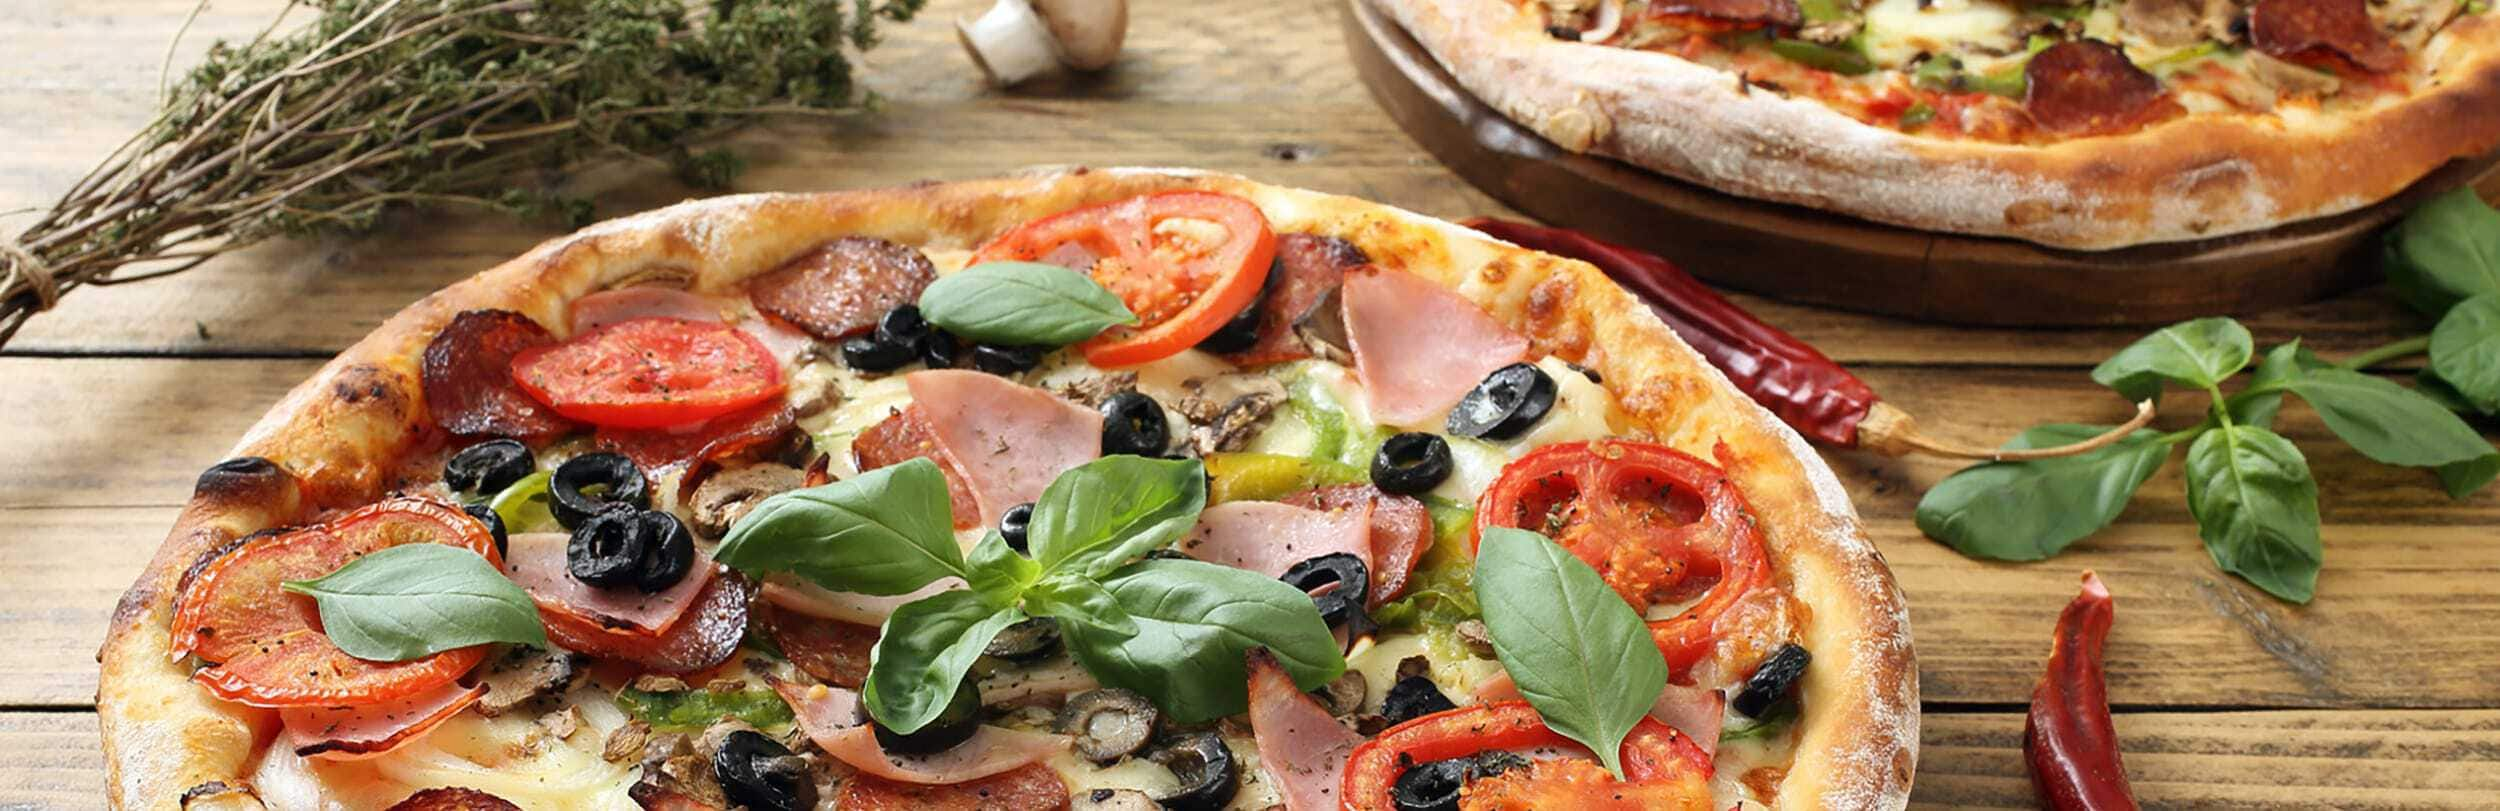 Kulinarische Glanzstücke: Pizza Salami mit Chili & Champignons